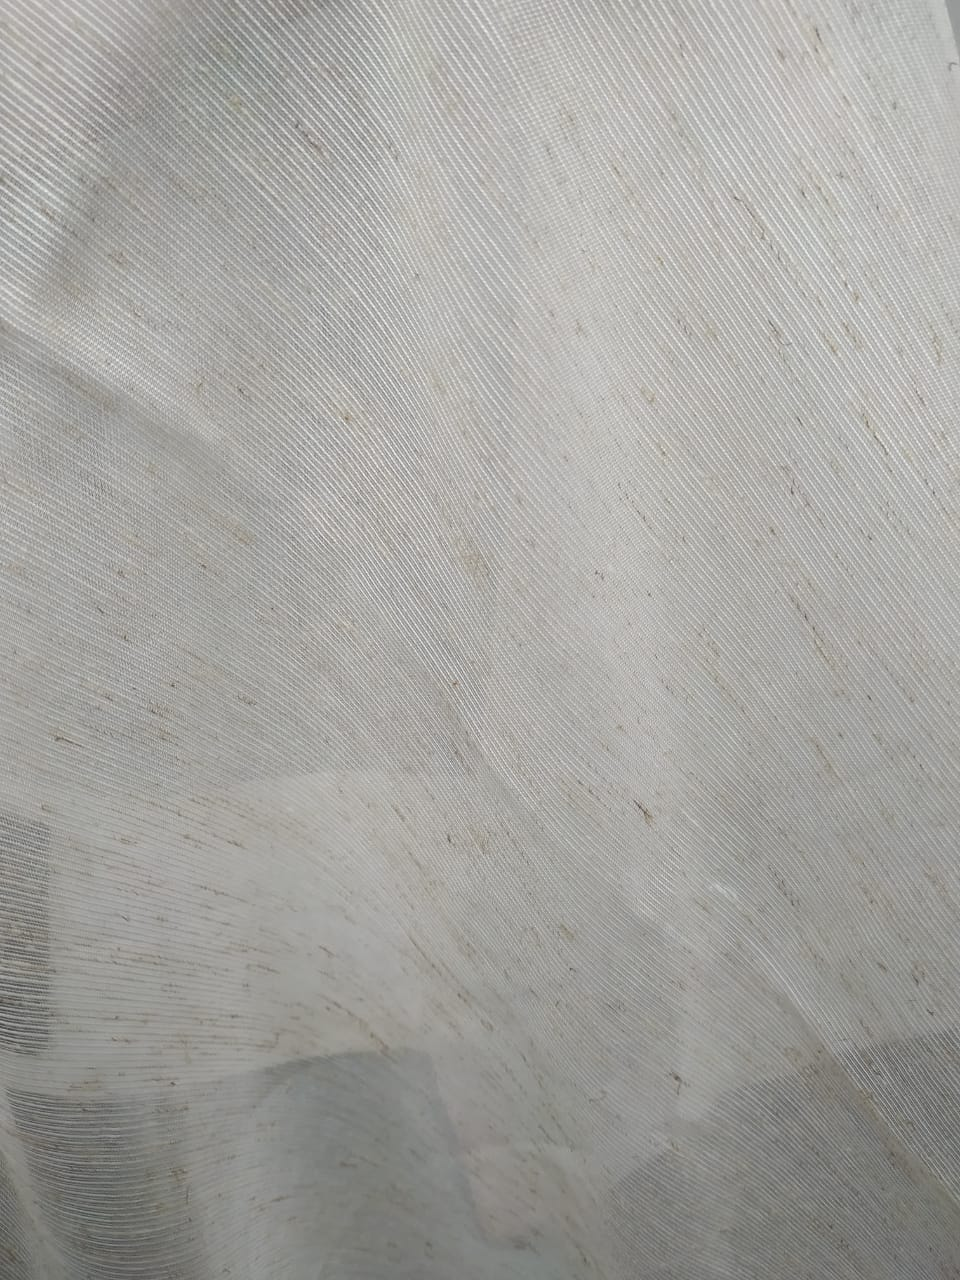 Cortina Voil Rustico com forro Blackout 70% Palha - Trilho 4,00x2,35 F